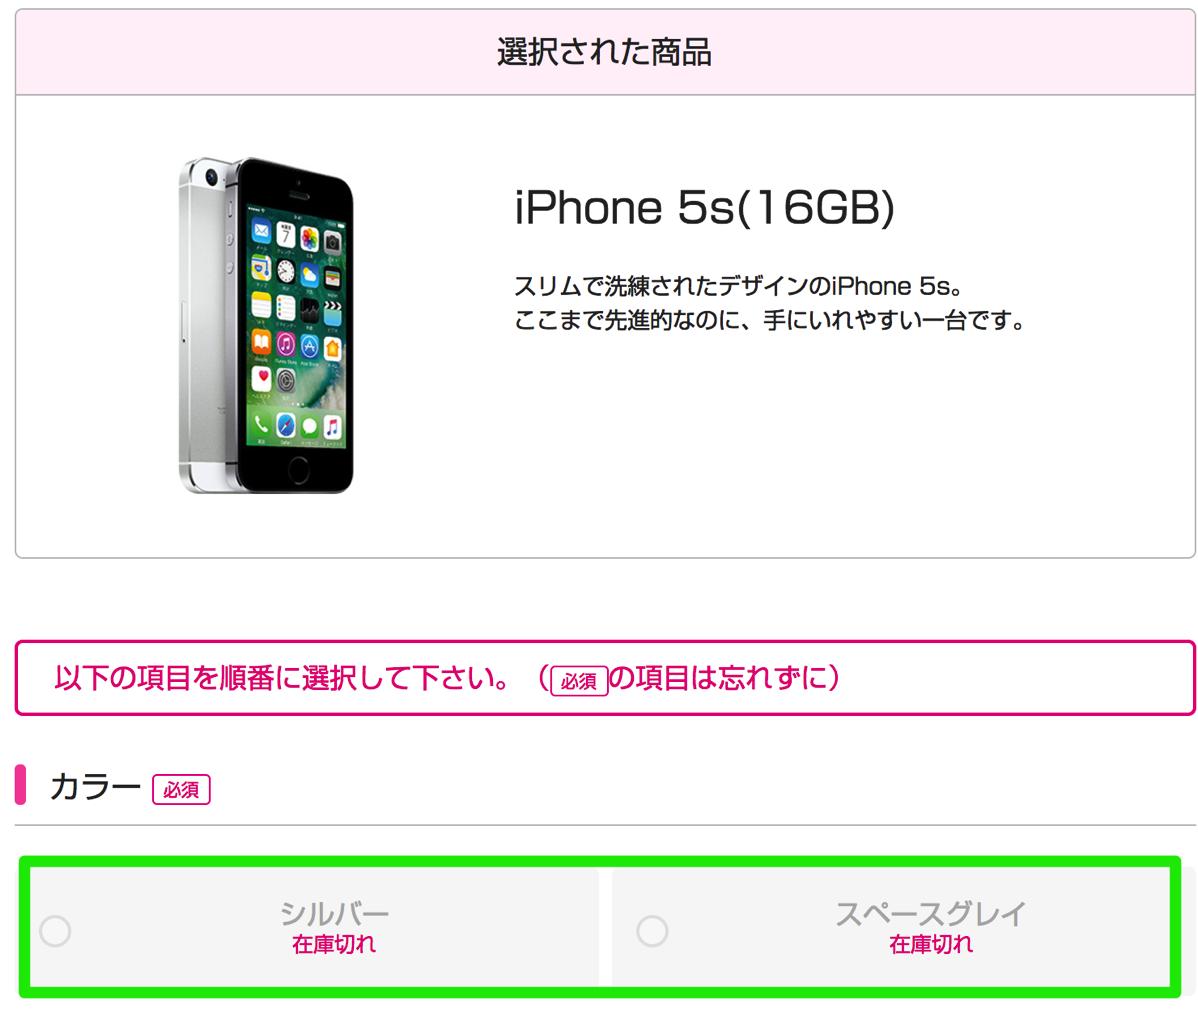 UQ mobile:iPhone 5sのオンライン販売を終了?